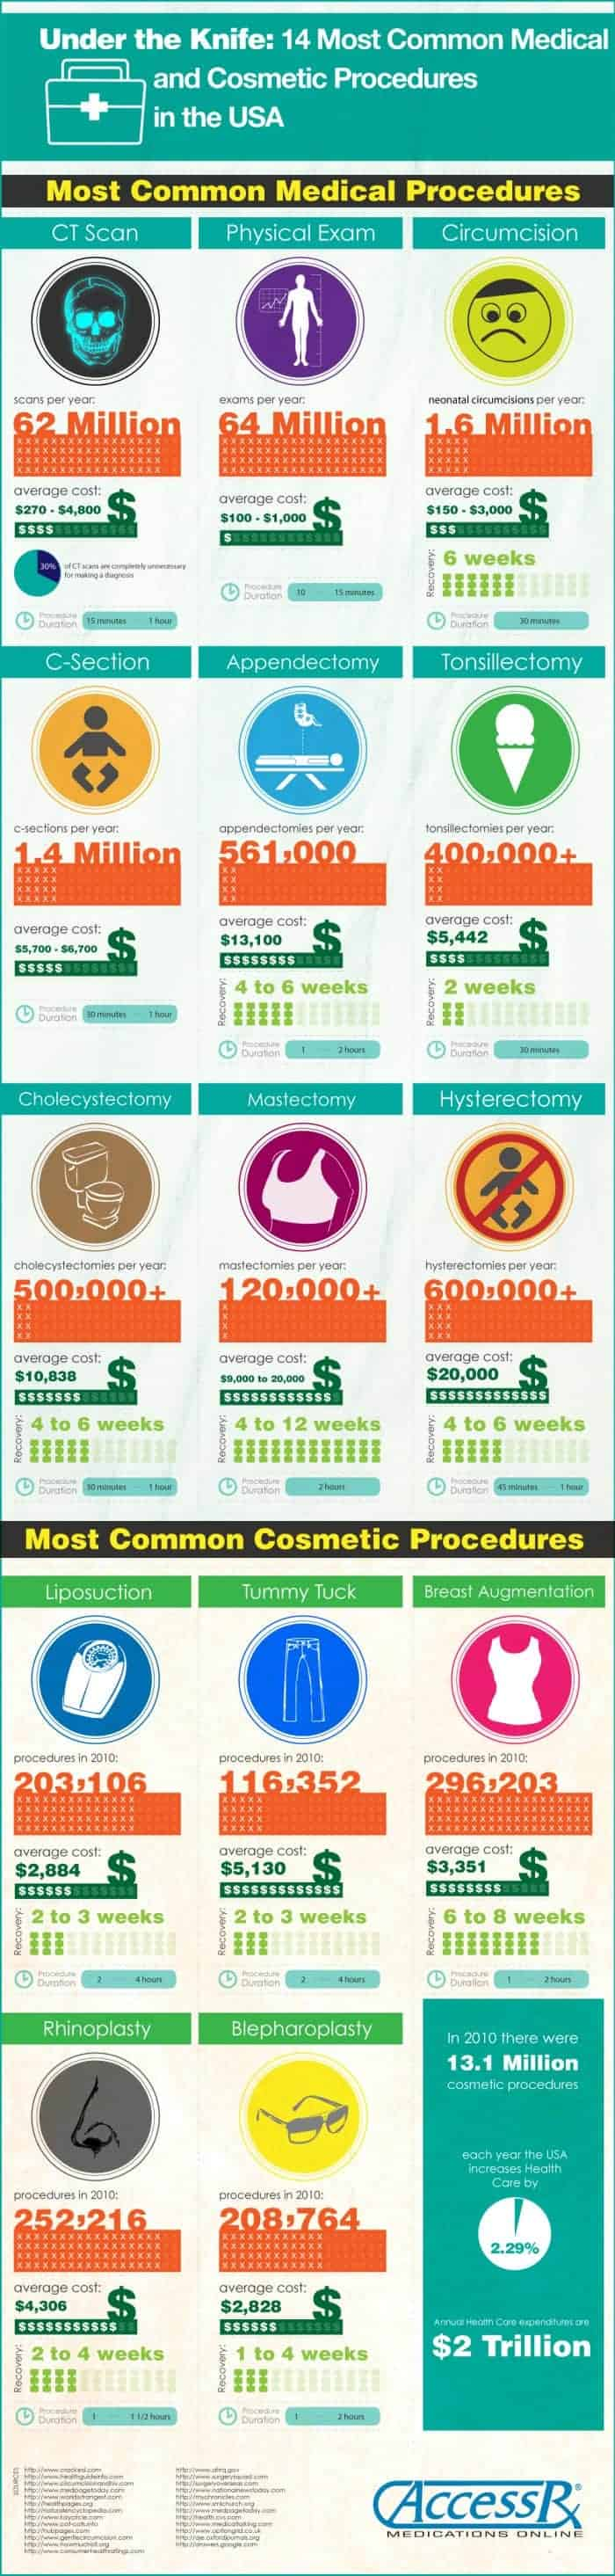 Medical Procedures USA Infographic